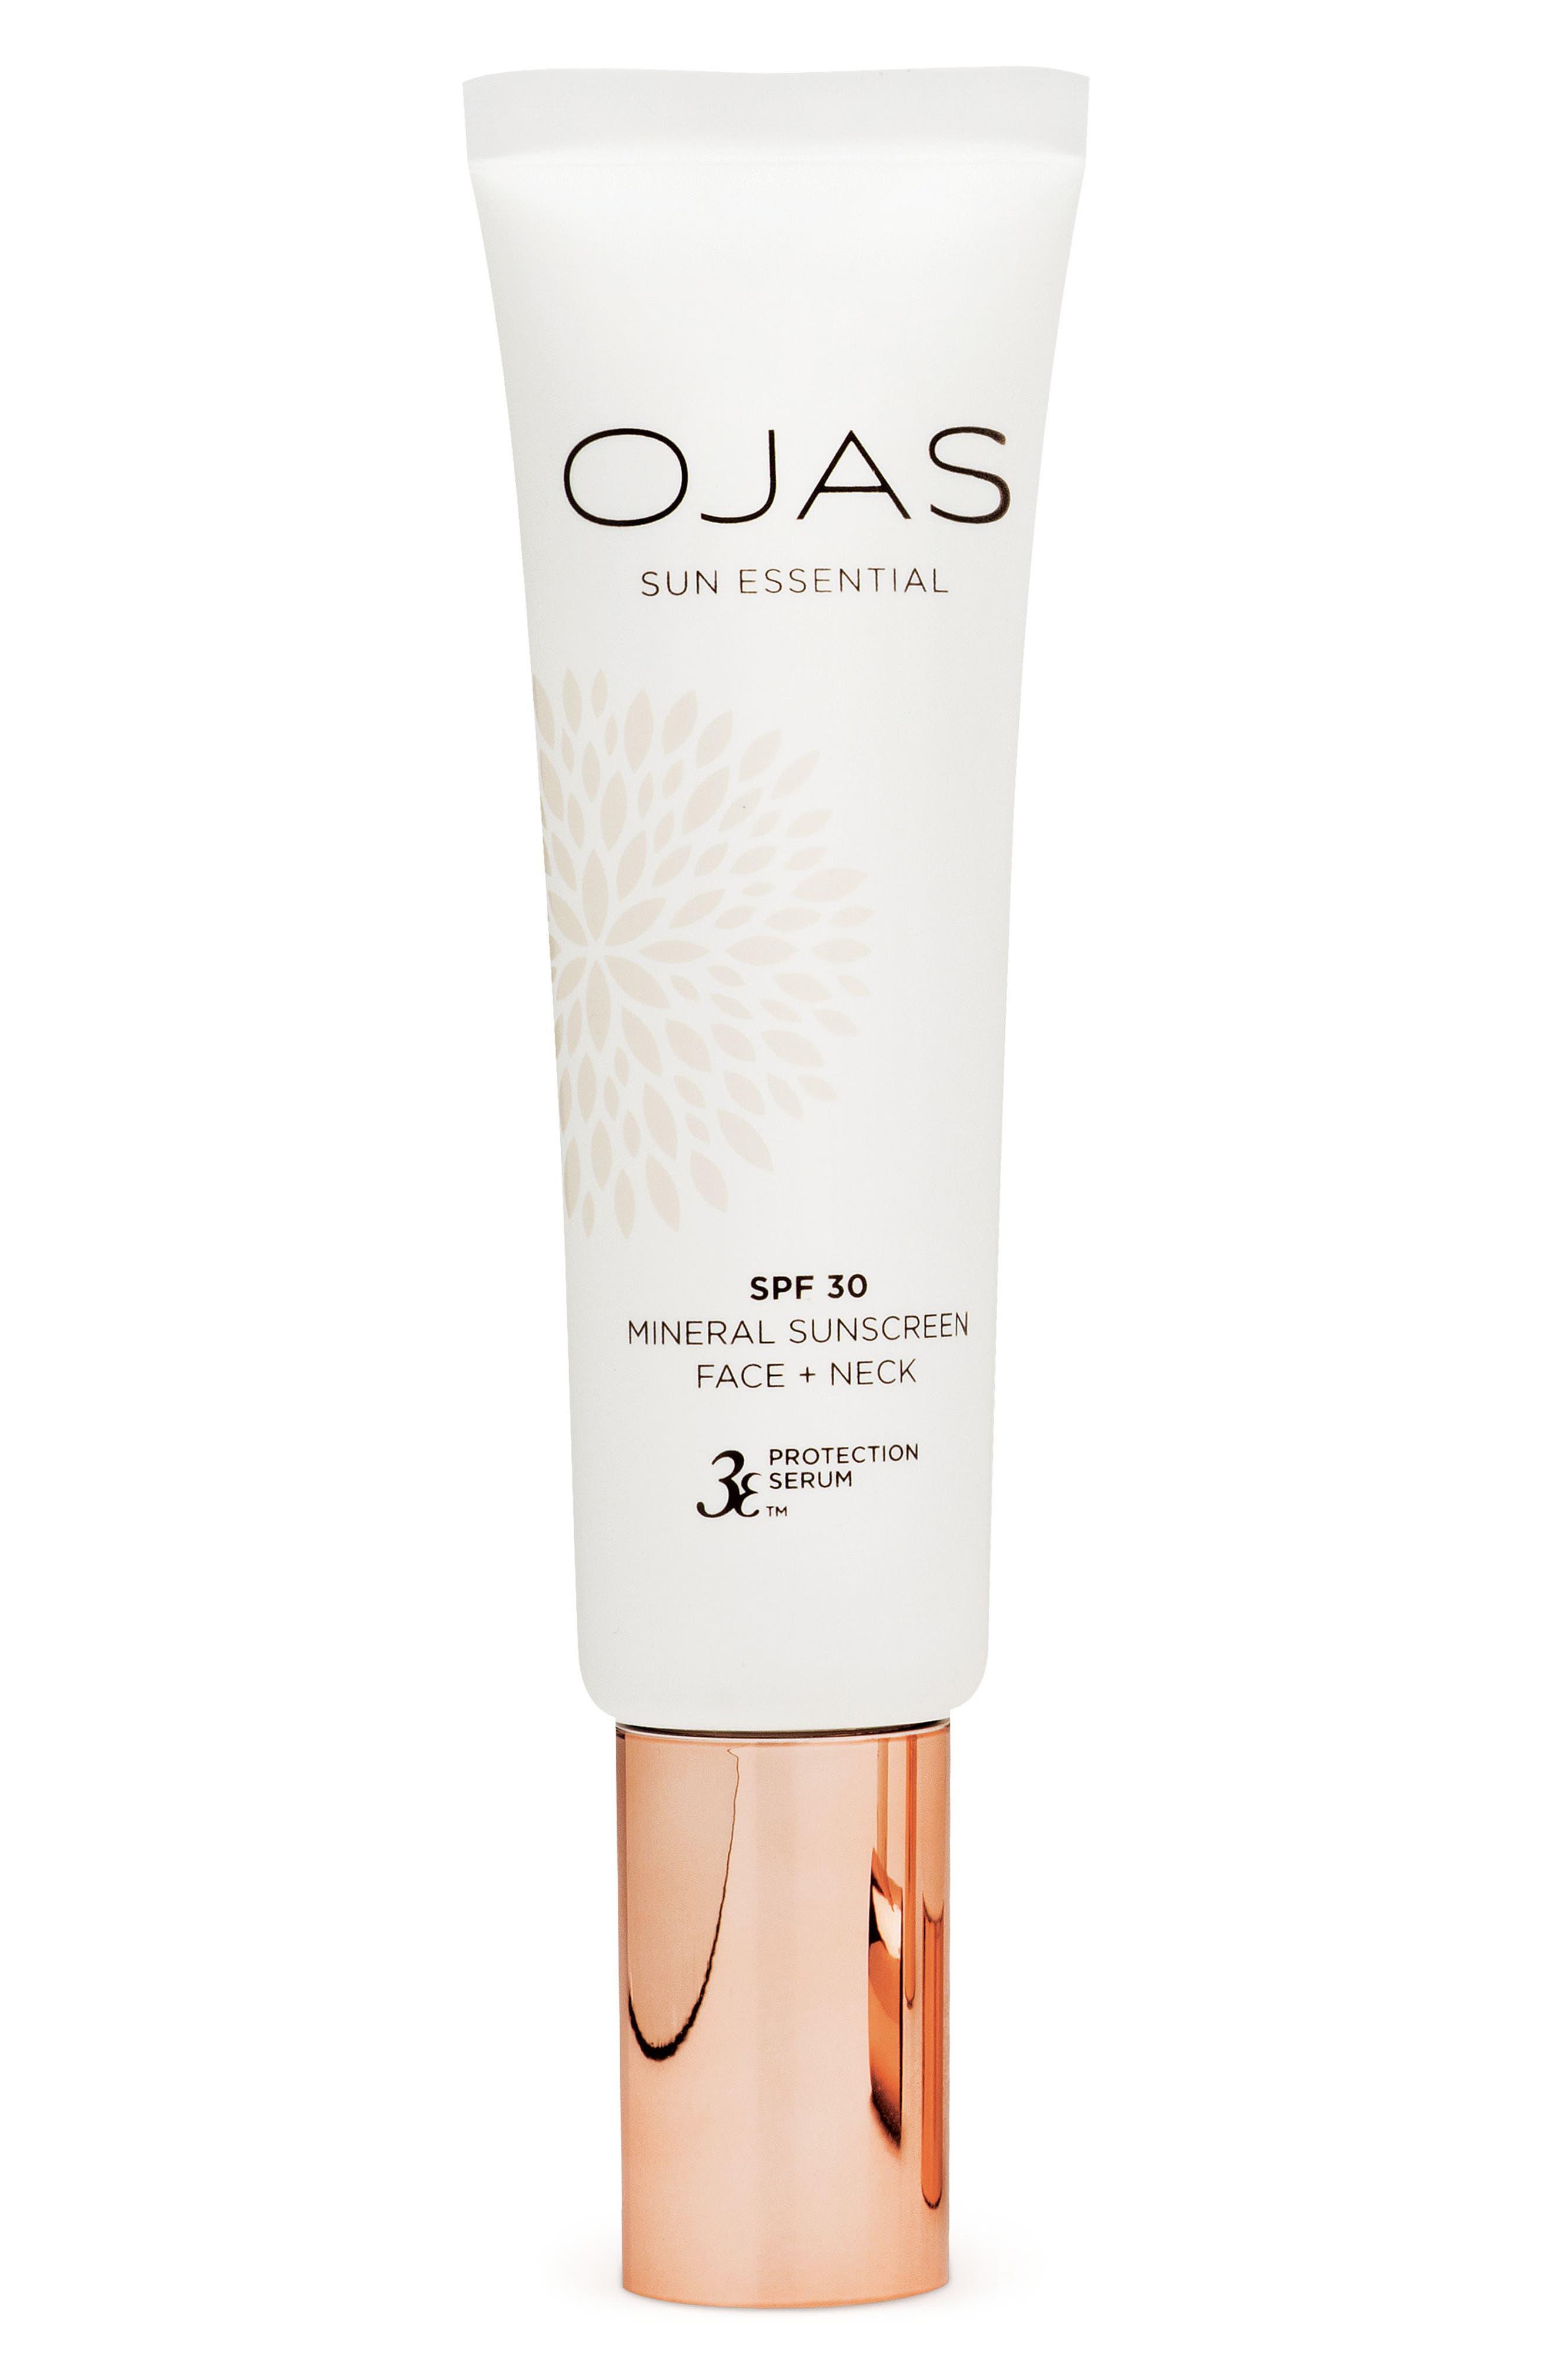 OJAS SPF 30 Mineral Sunscreen Face + Neck